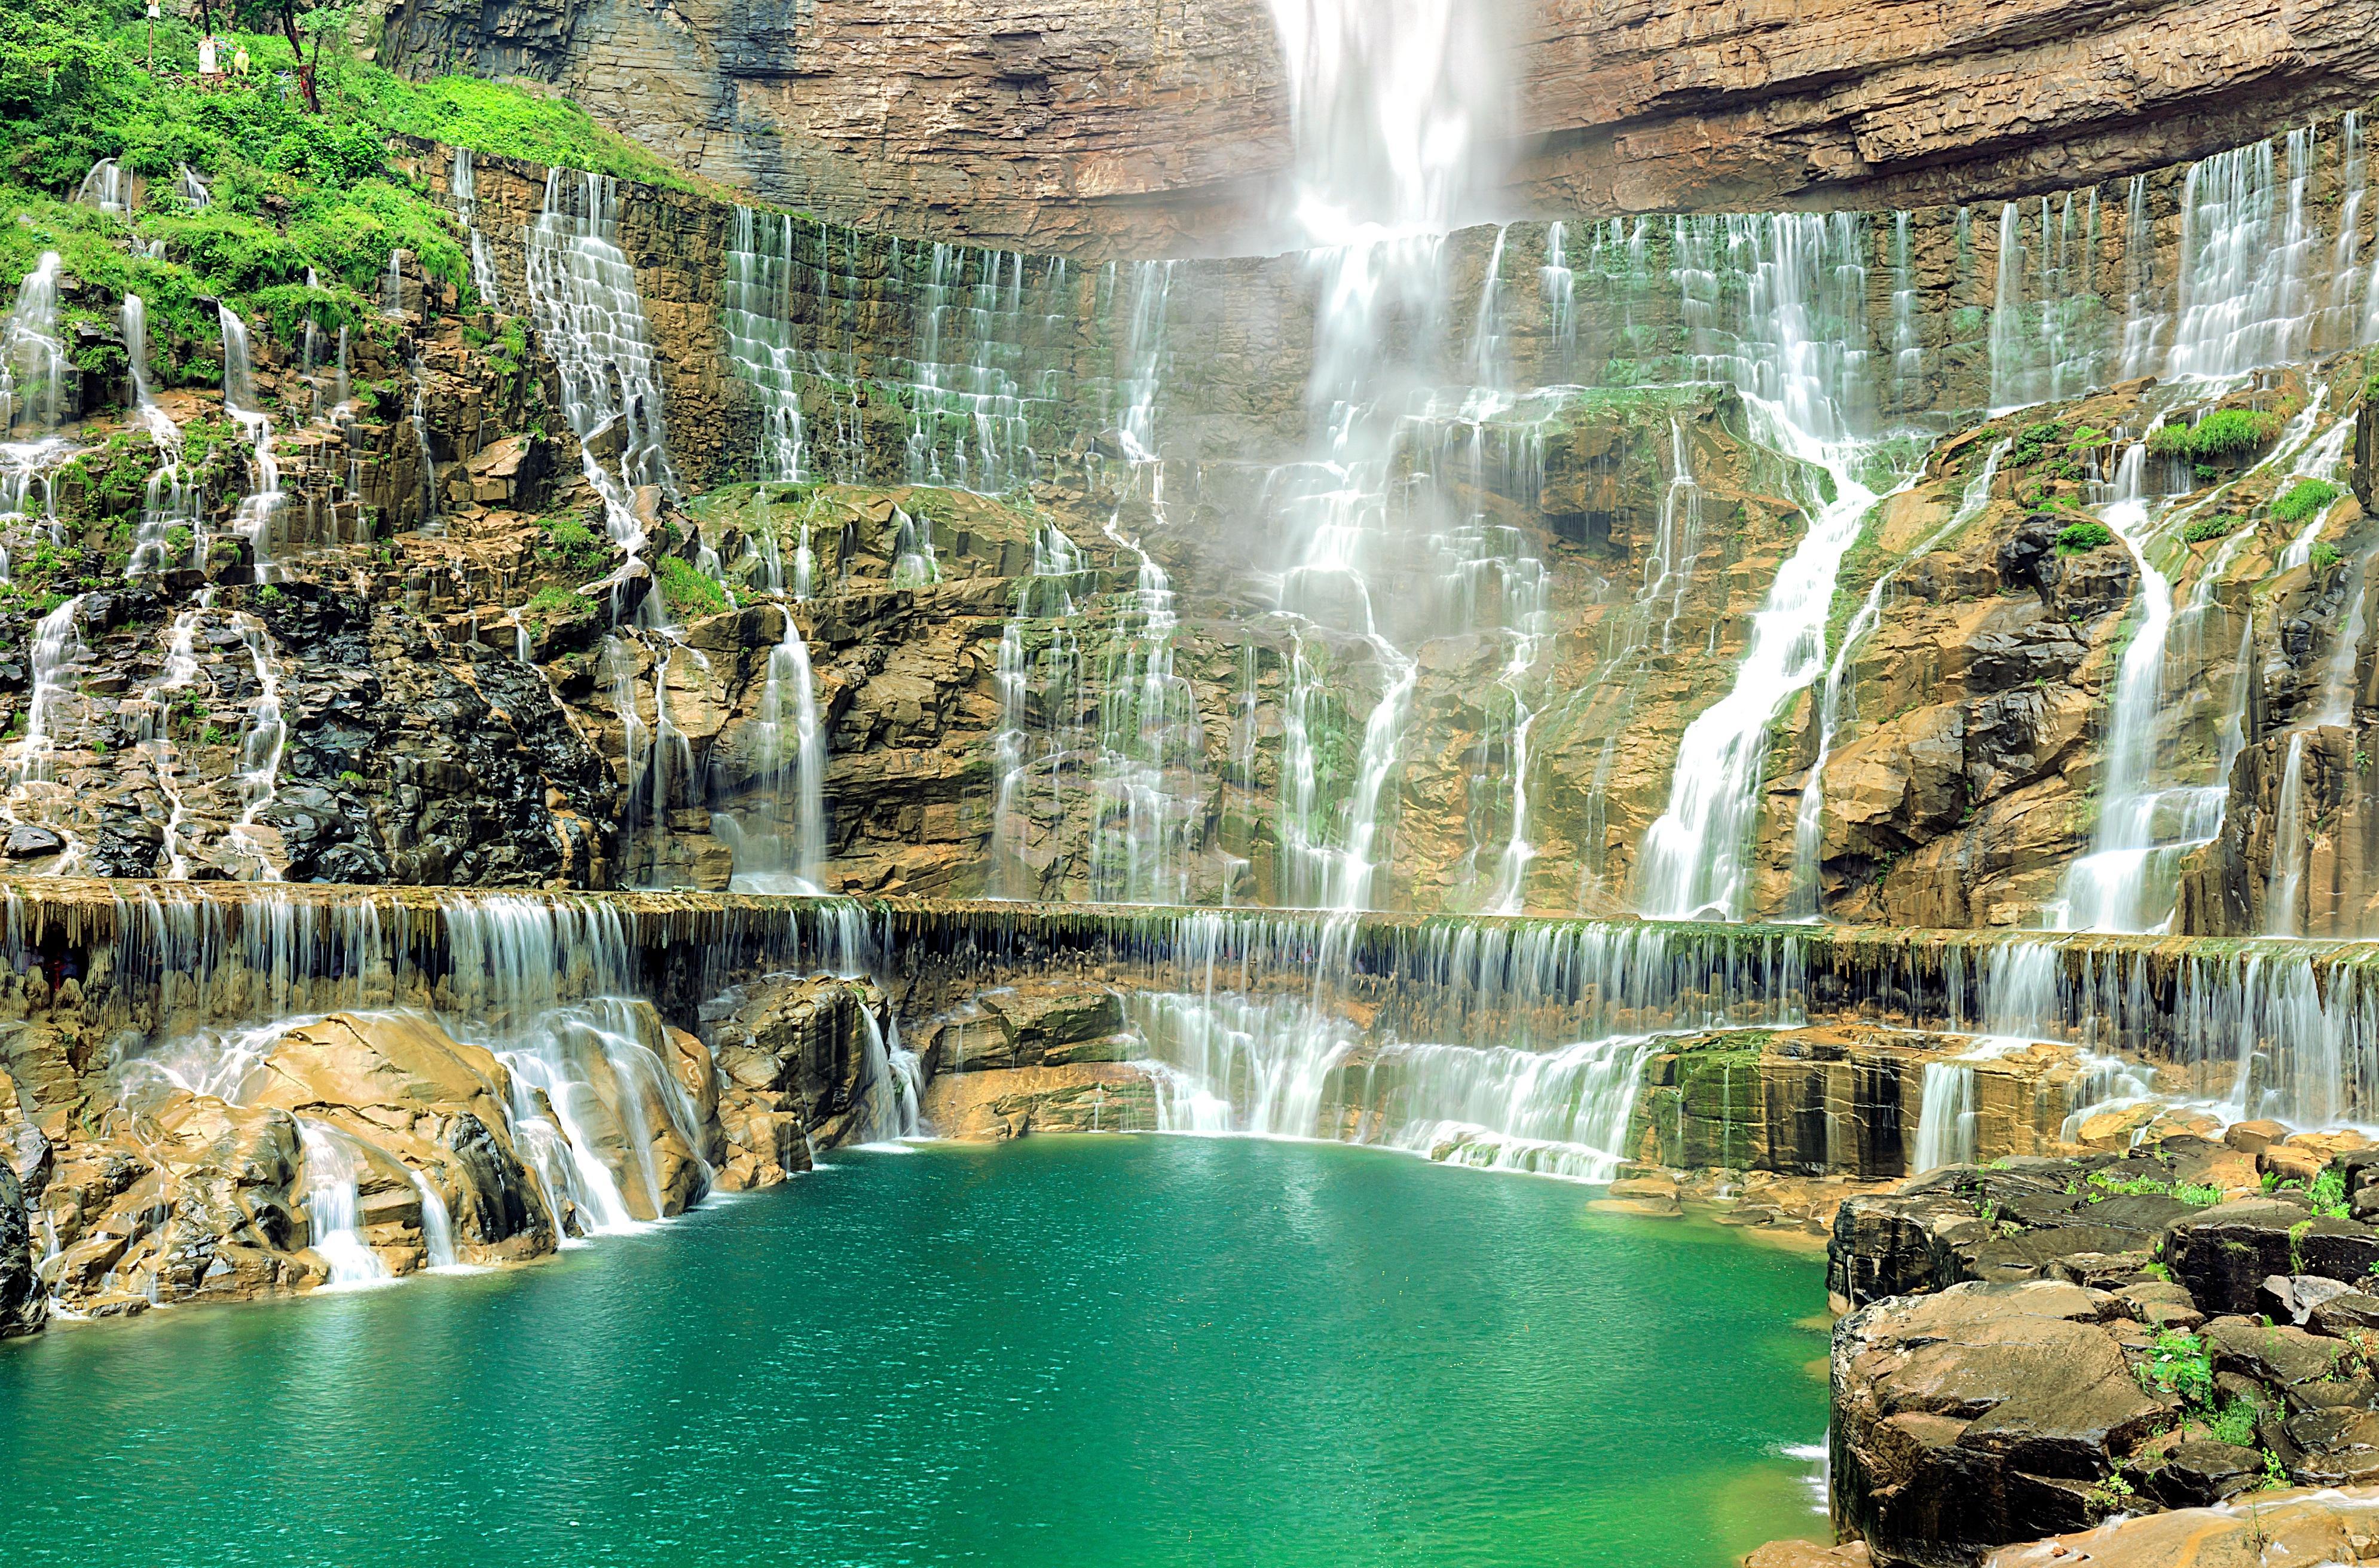 Baligouda Waterfall